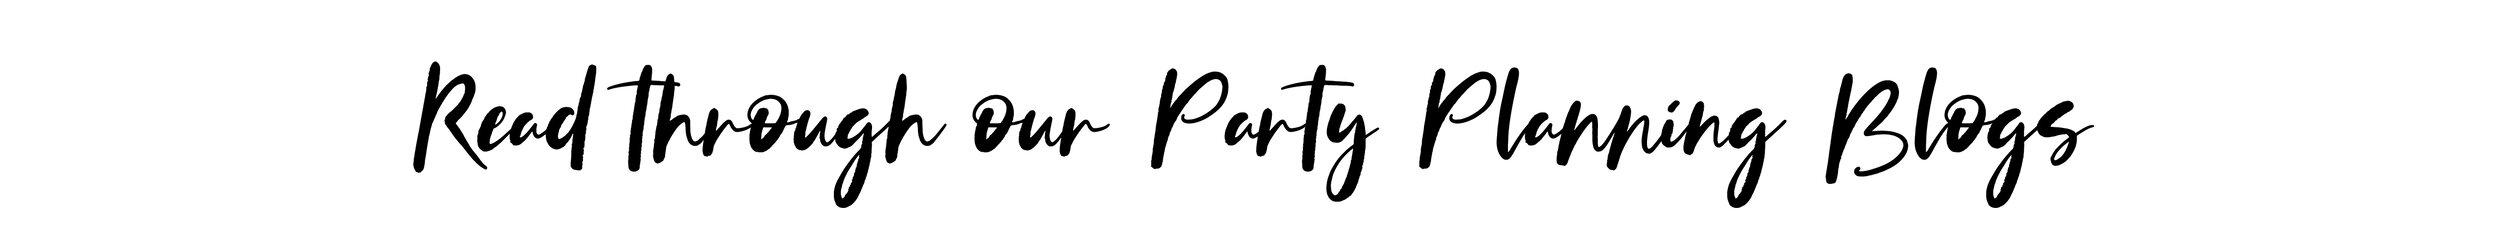 Read through our party planning blogs on shopmkkm.com